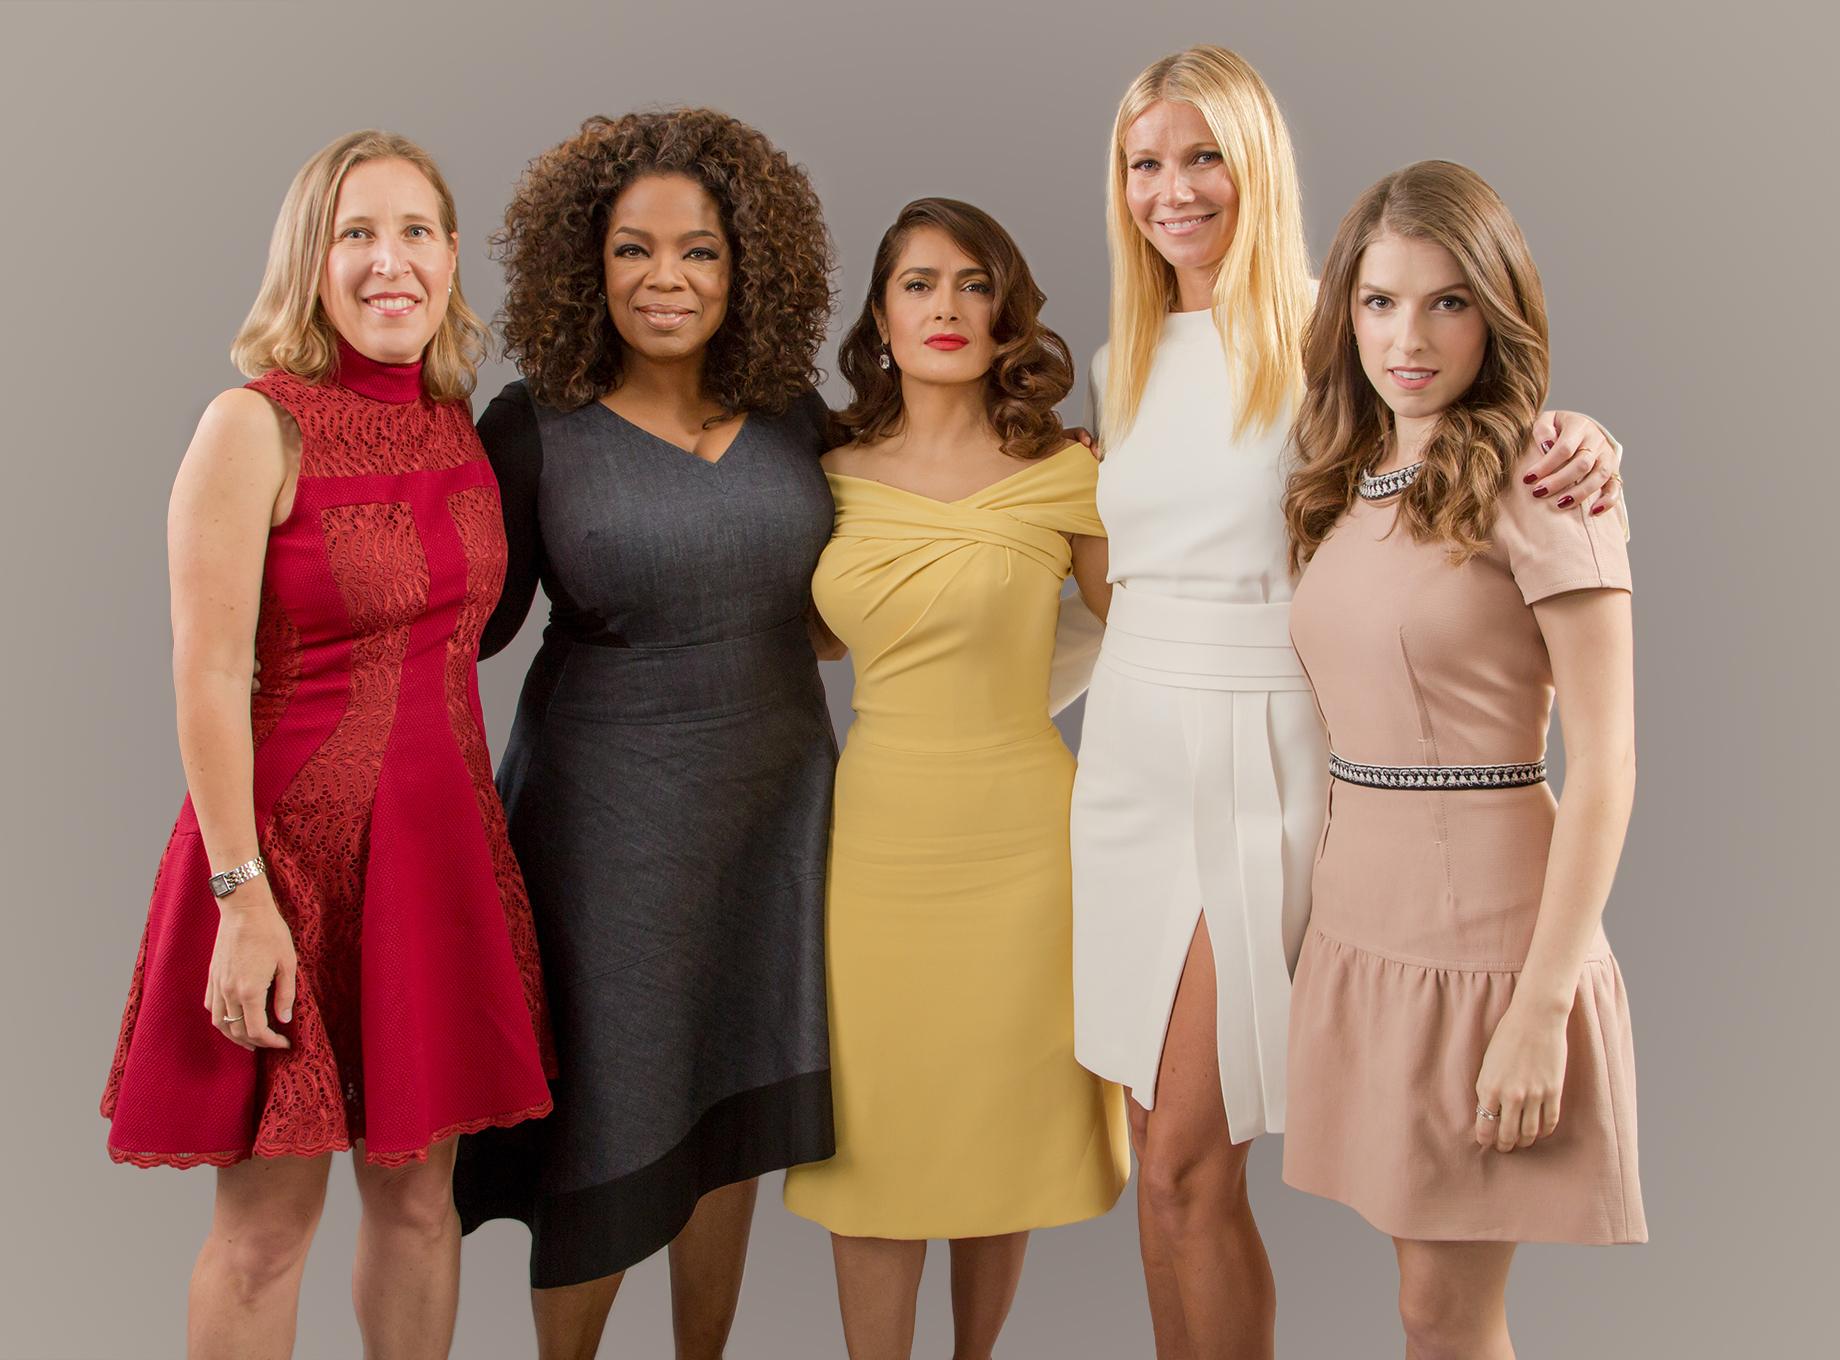 Susan Wojcicki, Oprah Winfrey, Salma Hayek, Gwyneth Paltrow and Anna Kendrick